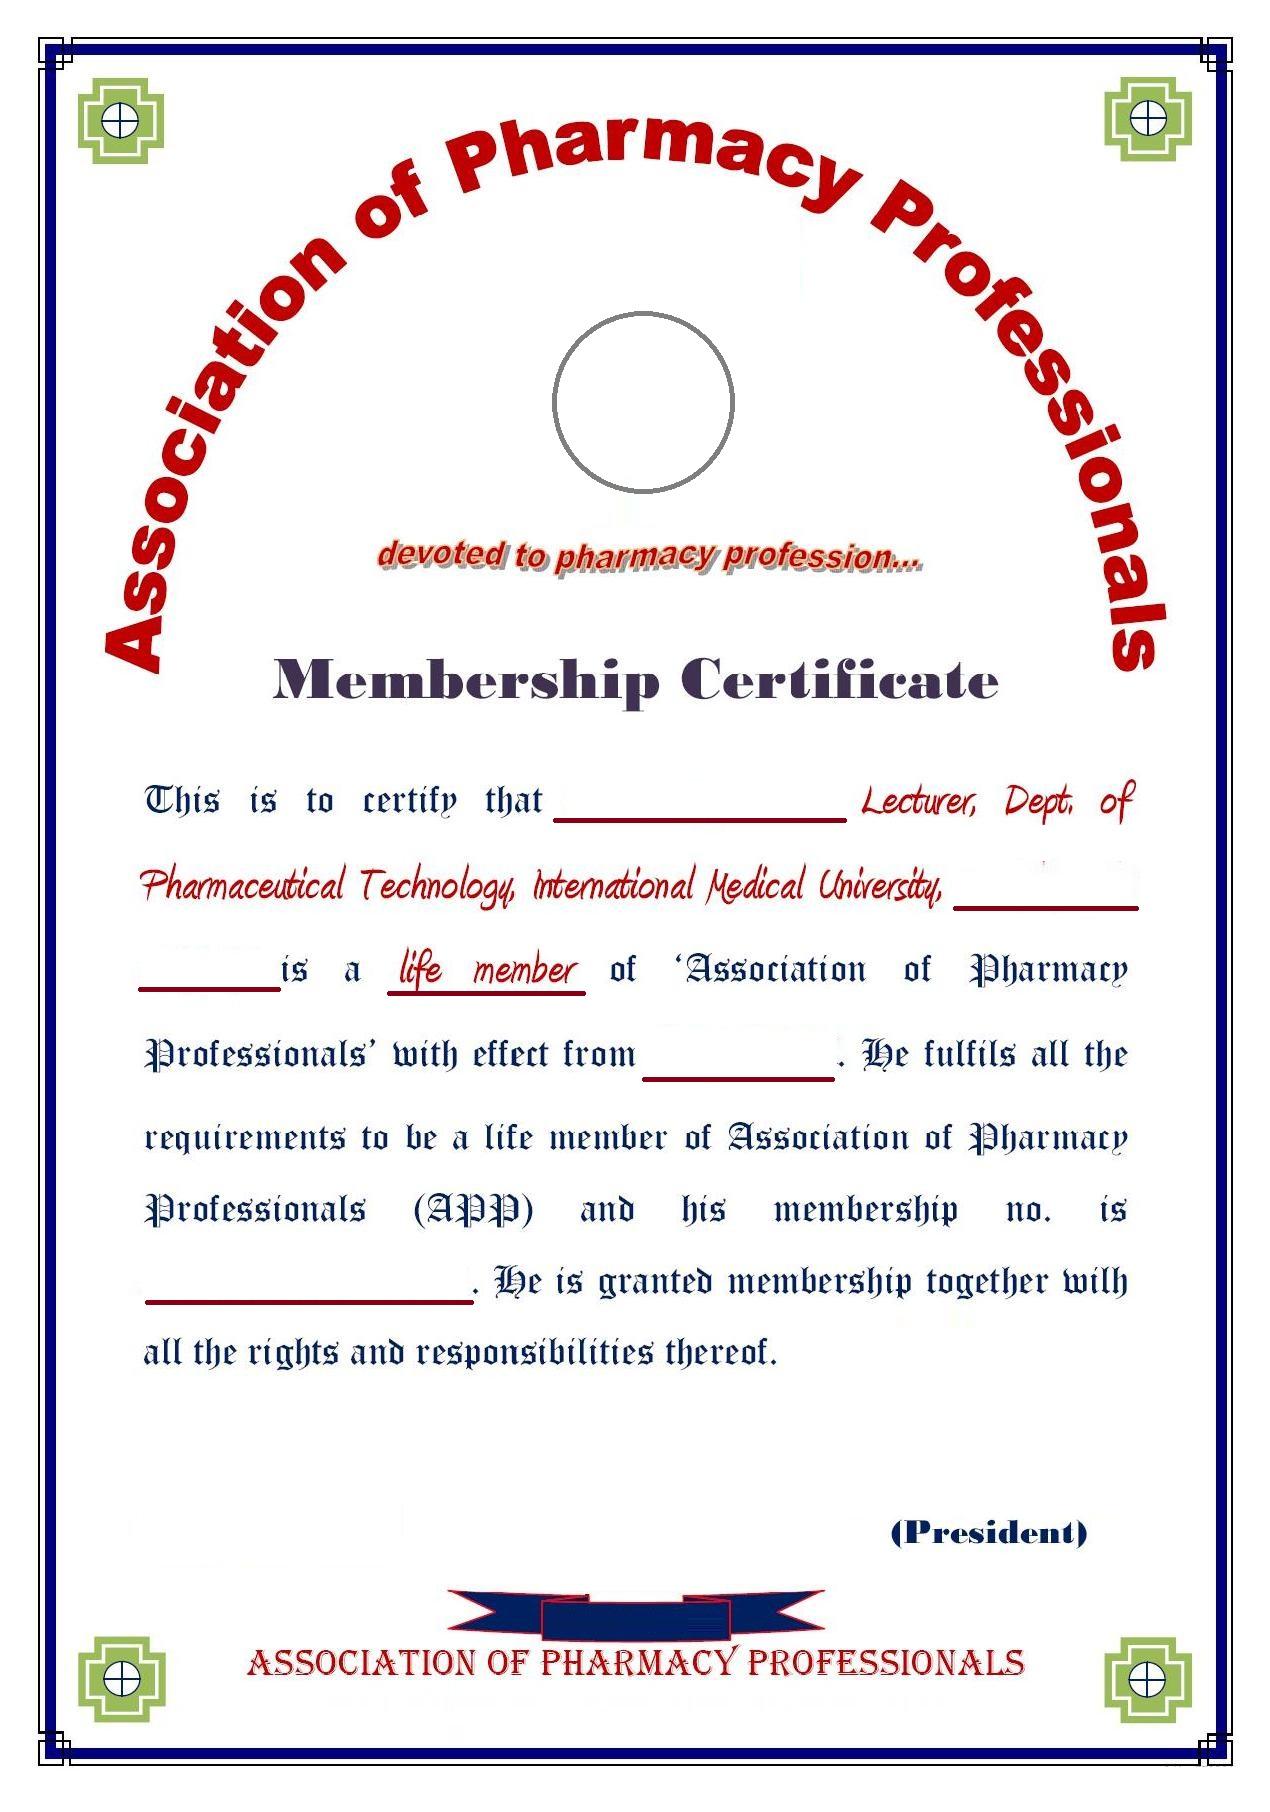 Pharmacy Technician Certificate Template